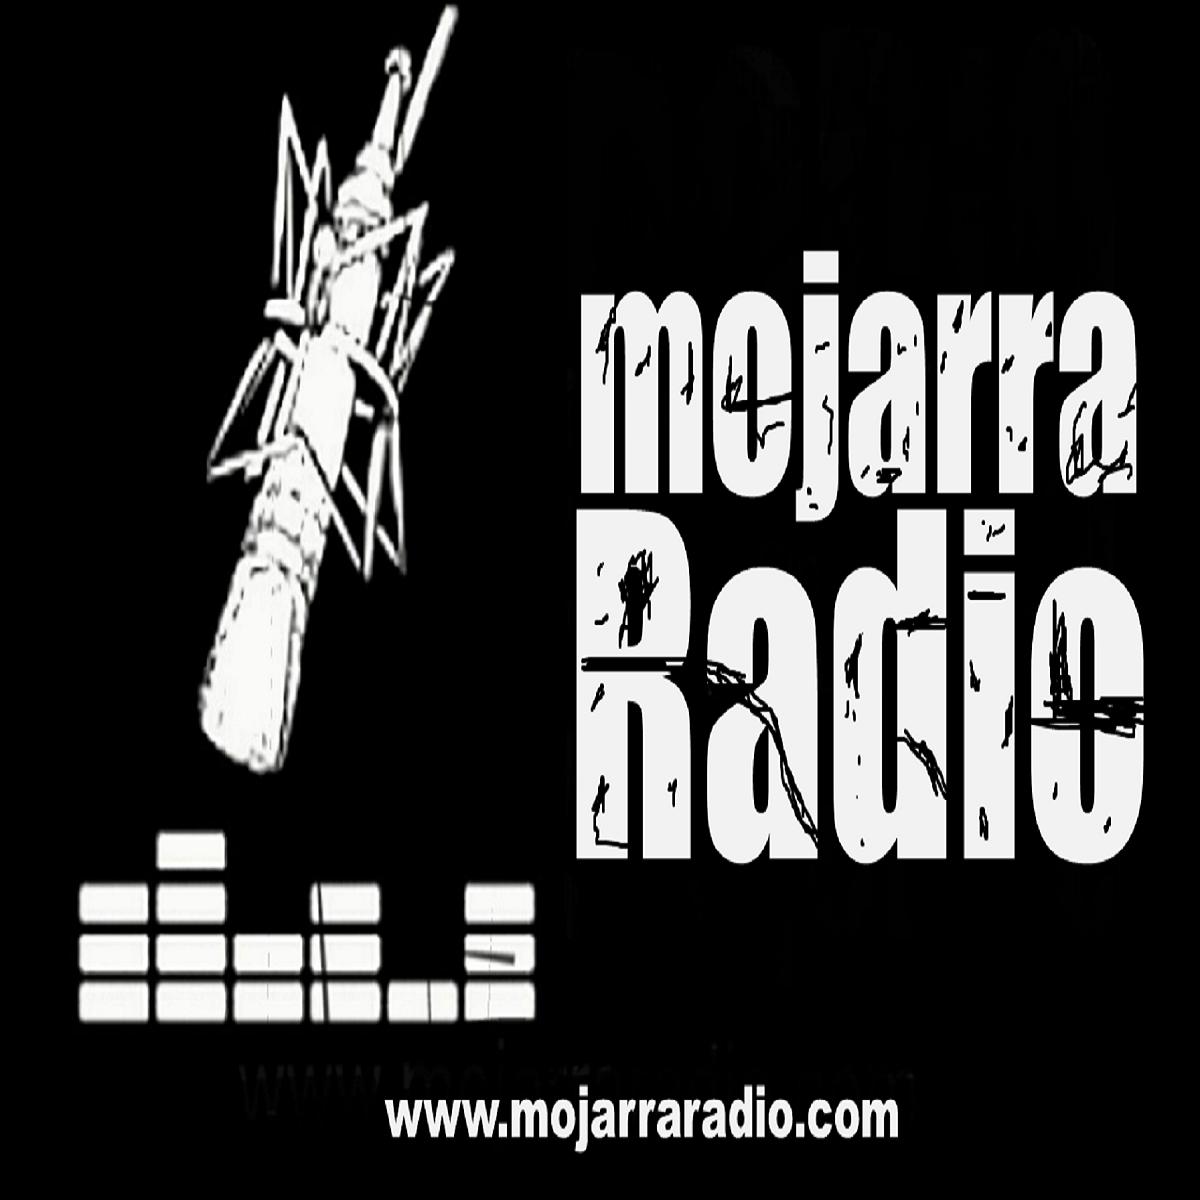 Mojarra Radio